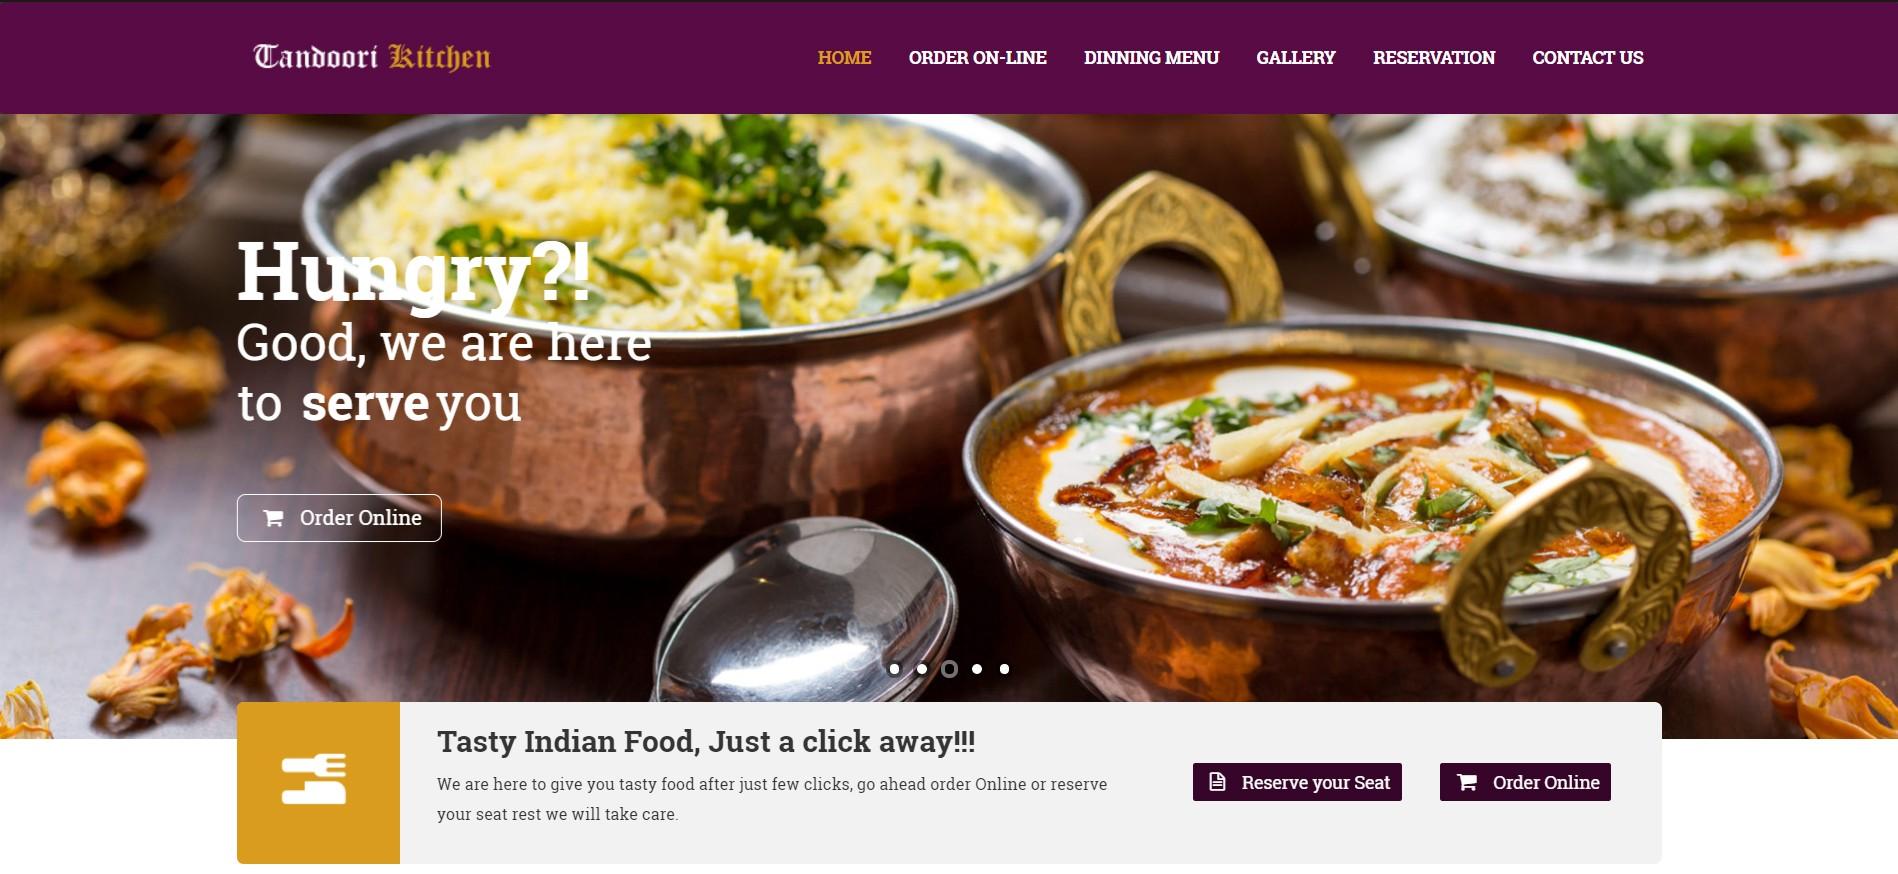 Tandoori Kitchen Review Ratings Information